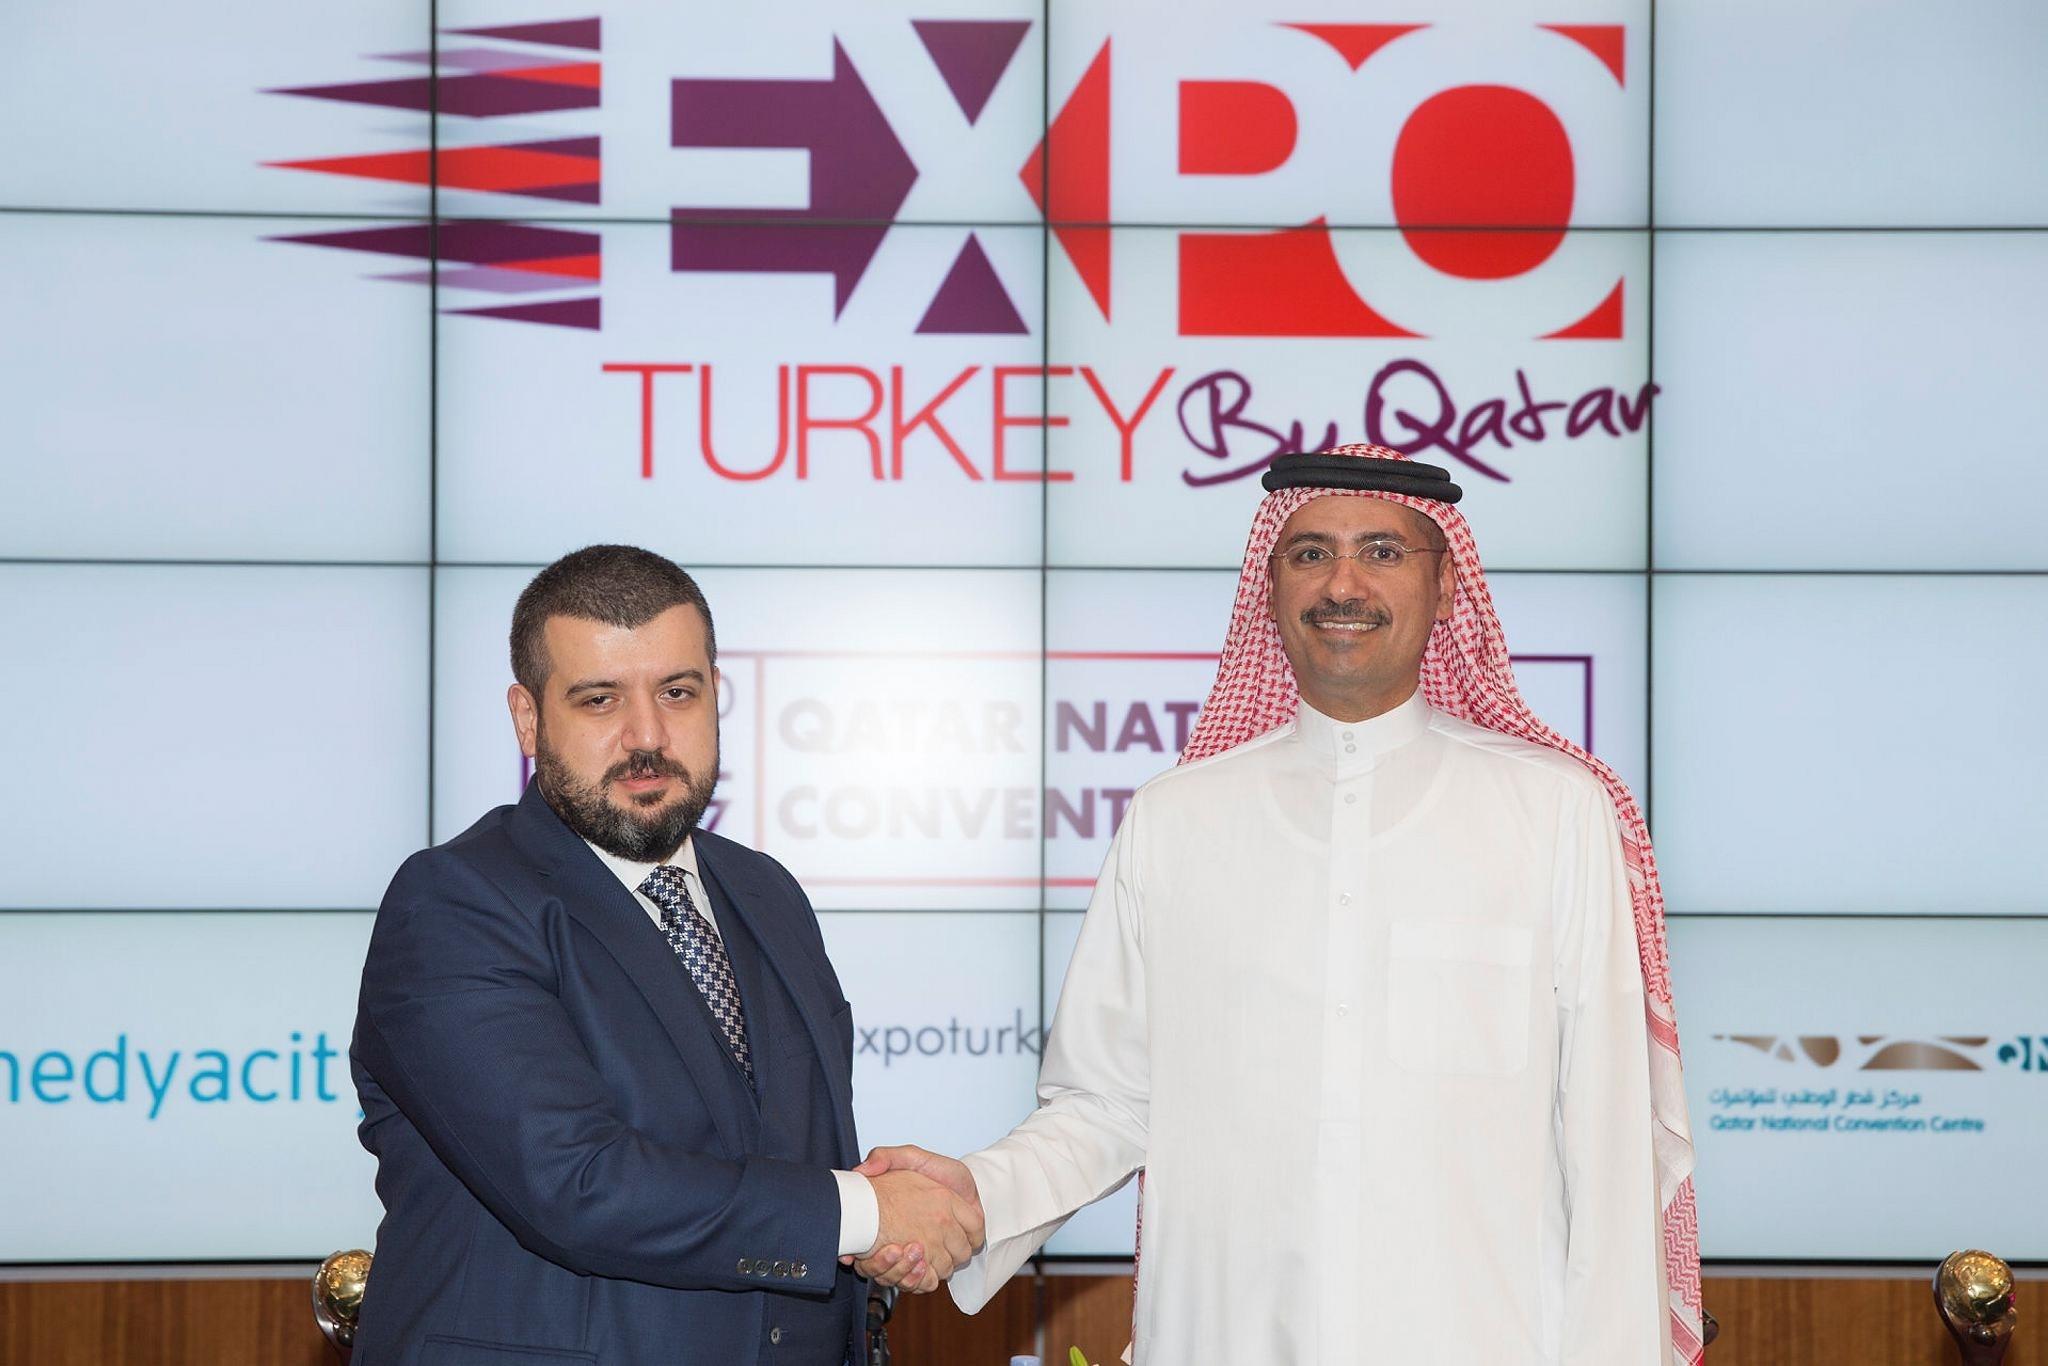 Abdul Aziz Al Emadi, CEO of QNCC and co-organizer of the event (R), and Hakan Kurt, chairman of Medyacity